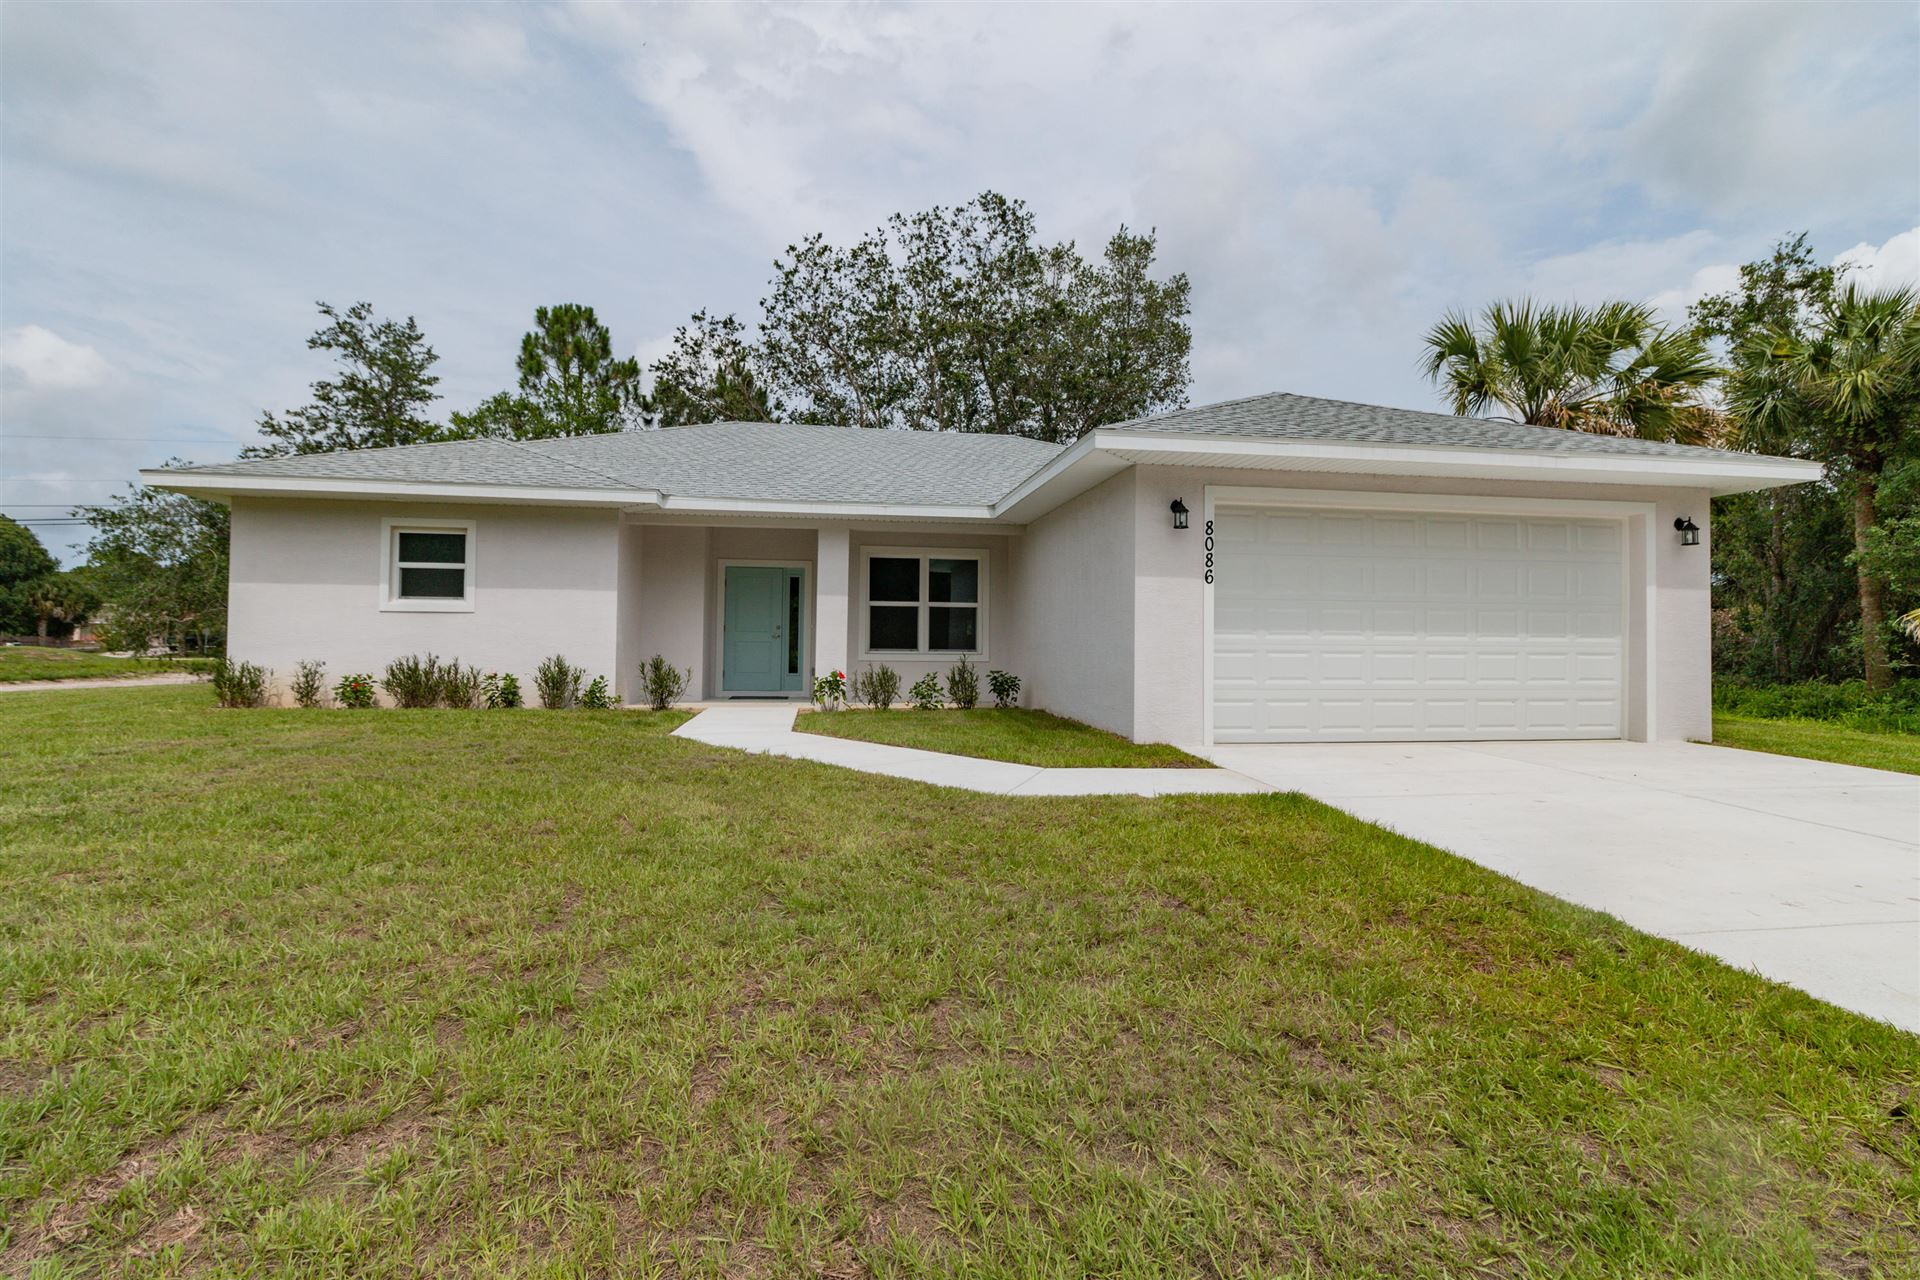 Photo of 8086 106 Avenue, Vero Beach, FL 32967 (MLS # RX-10627503)